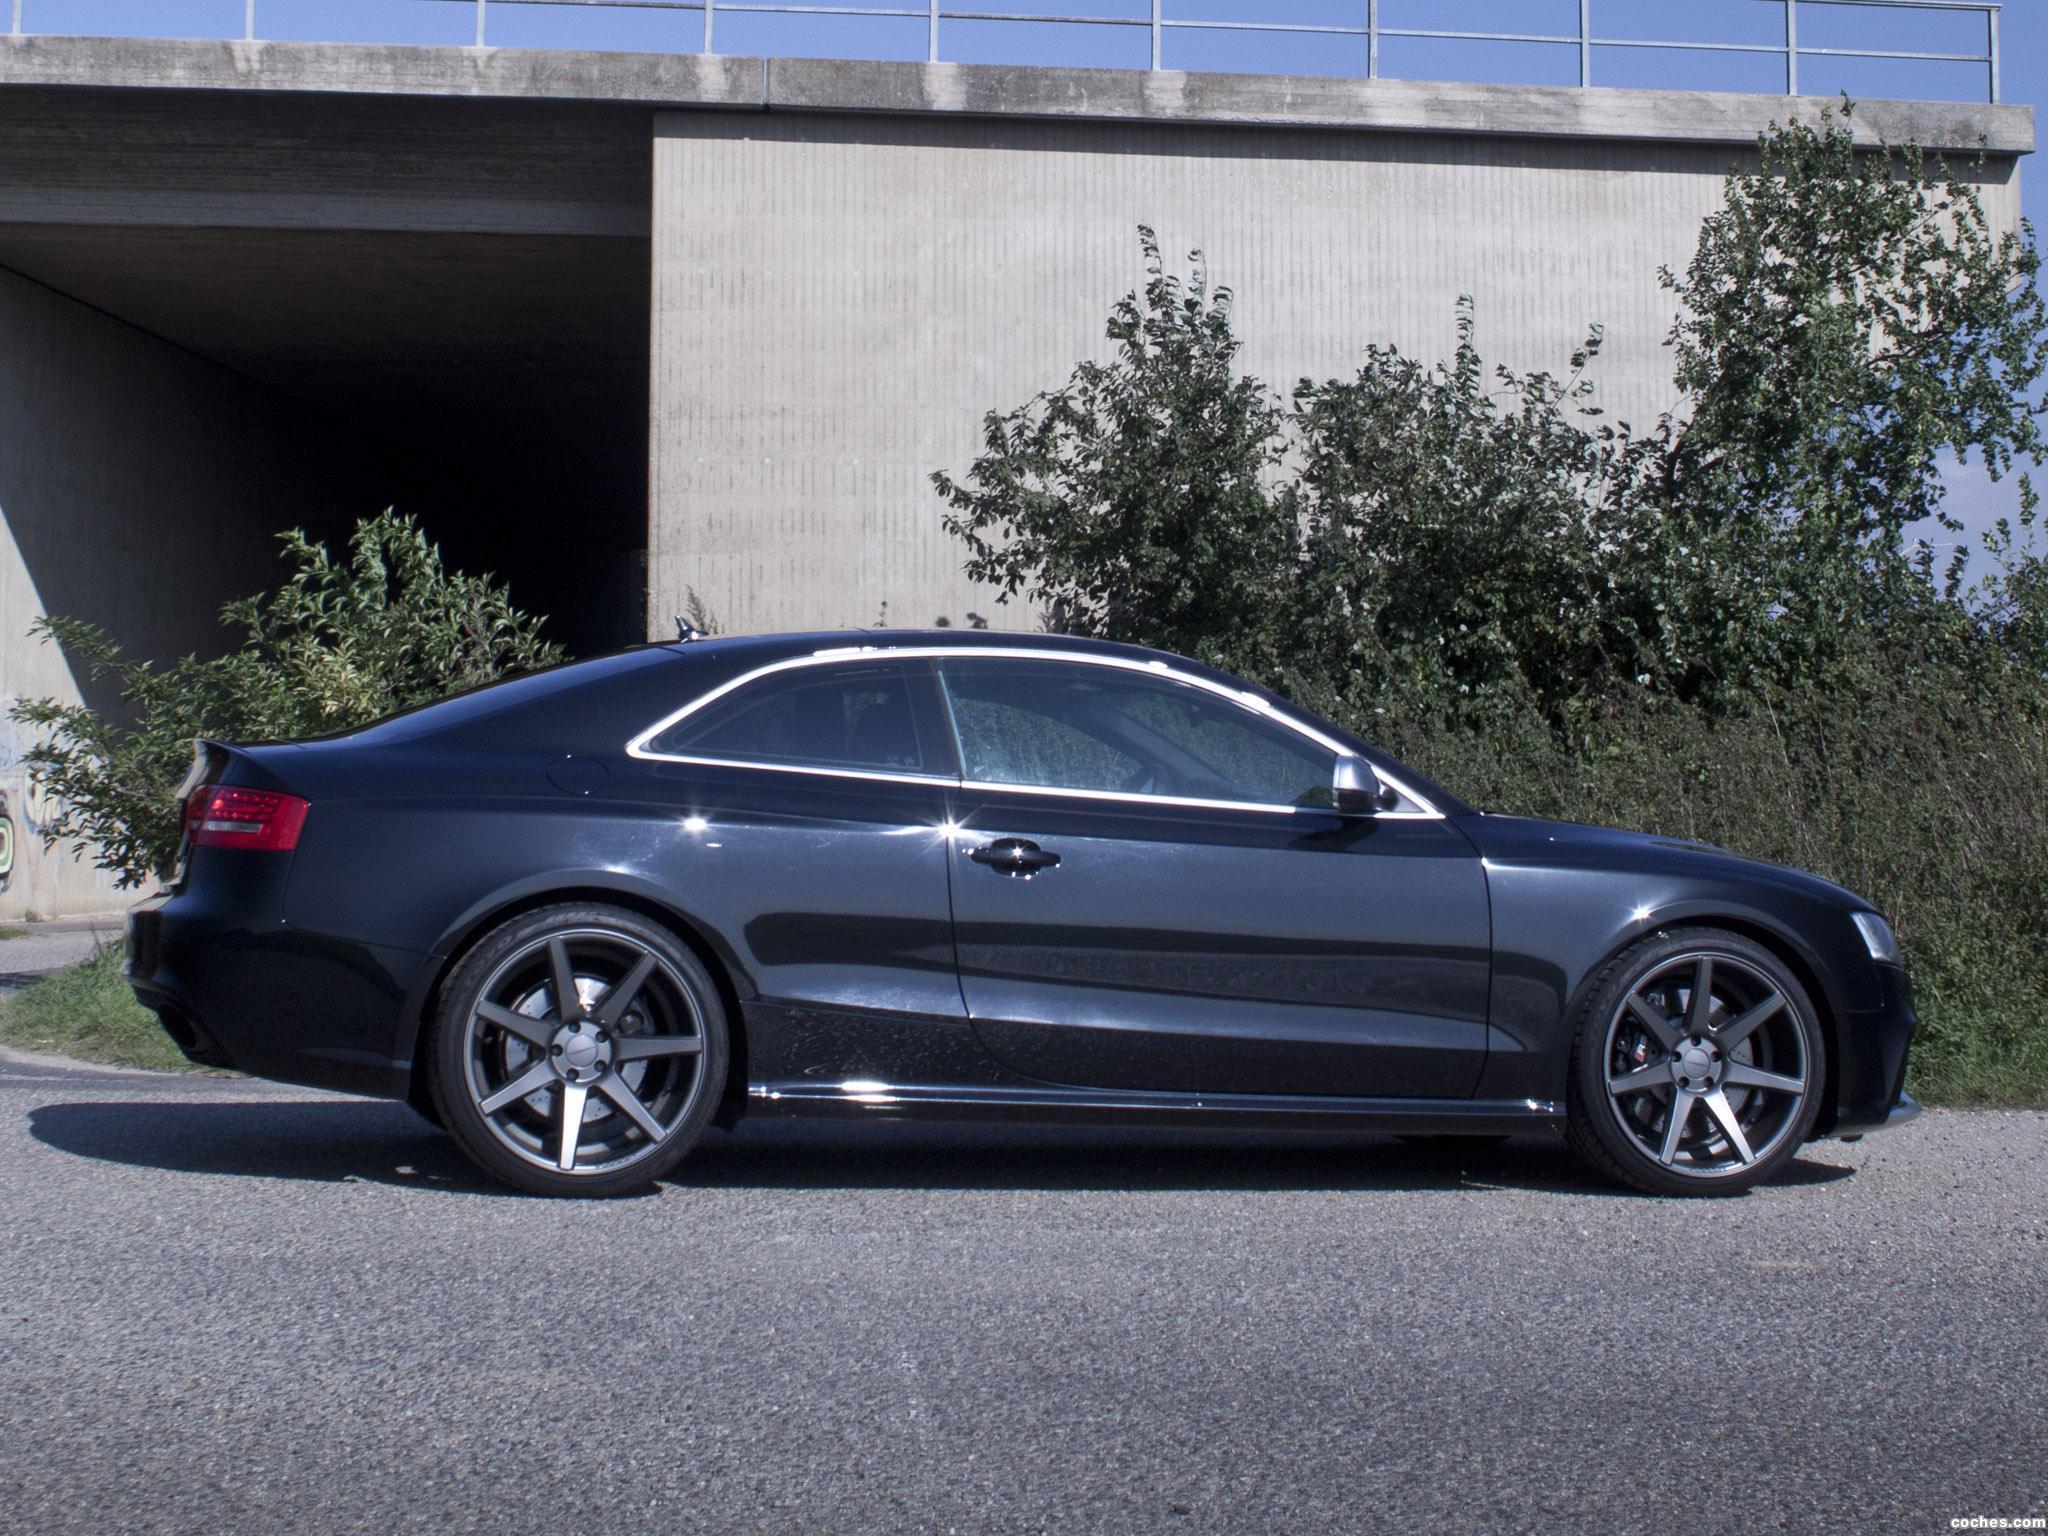 Foto 3 de Audi Mcchip DKR Audi RS5 Kompressor 2013